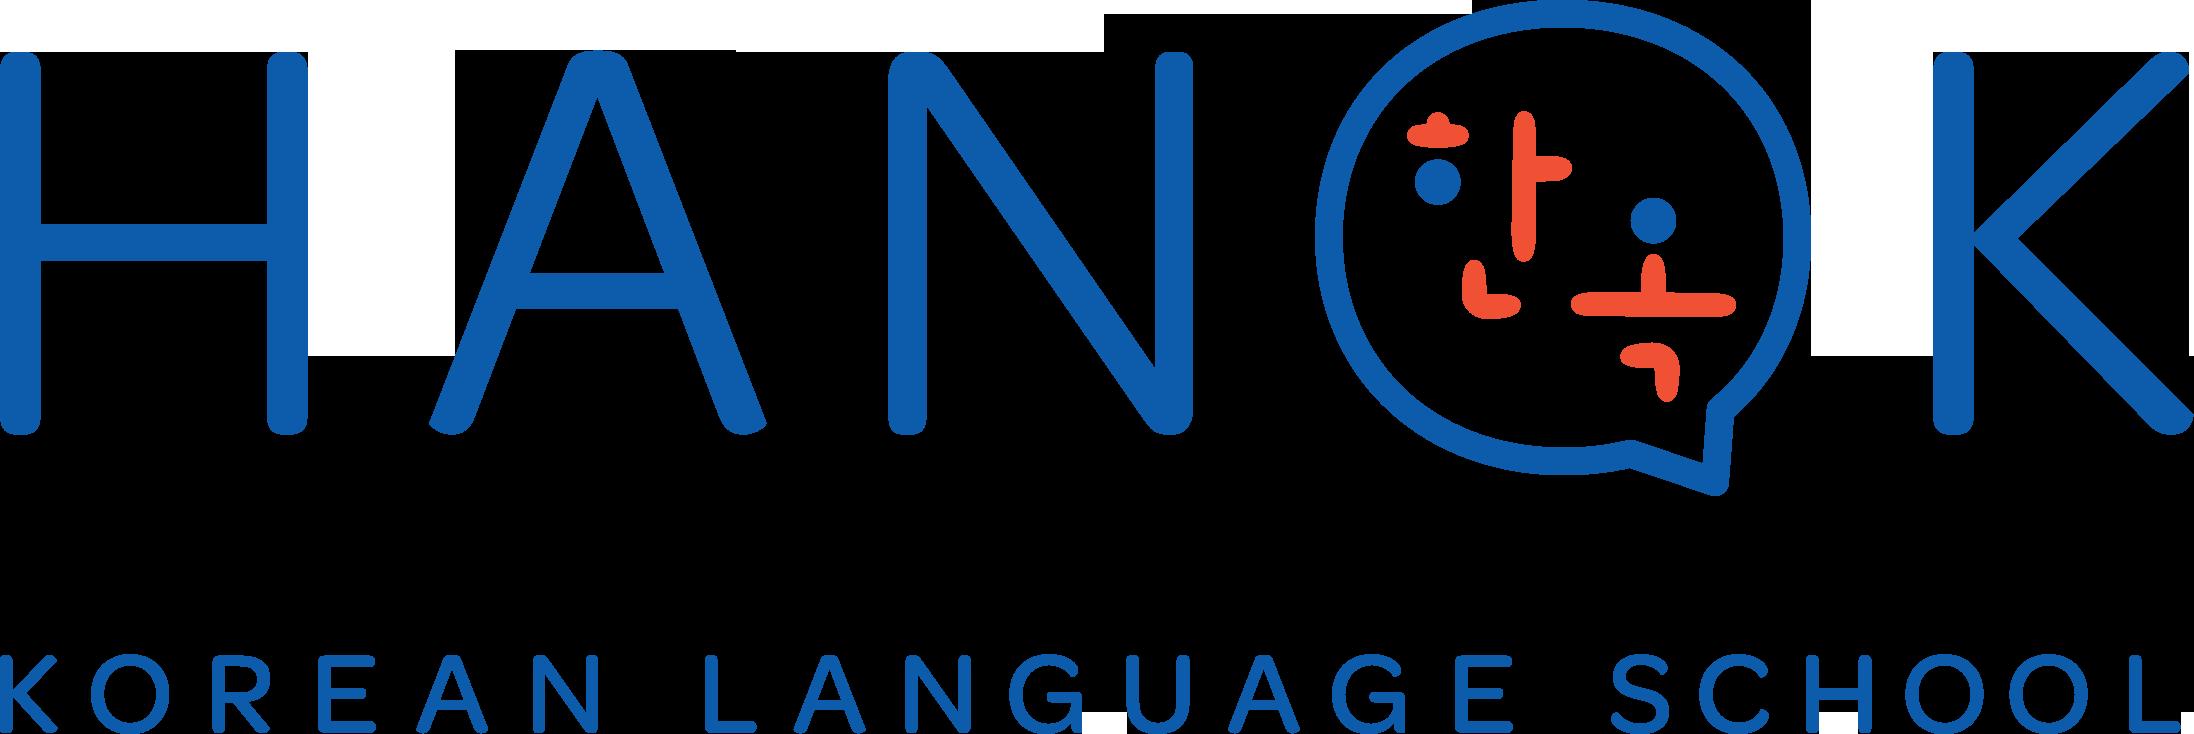 HANOK INTERMEDIATE 1 Qualification Test